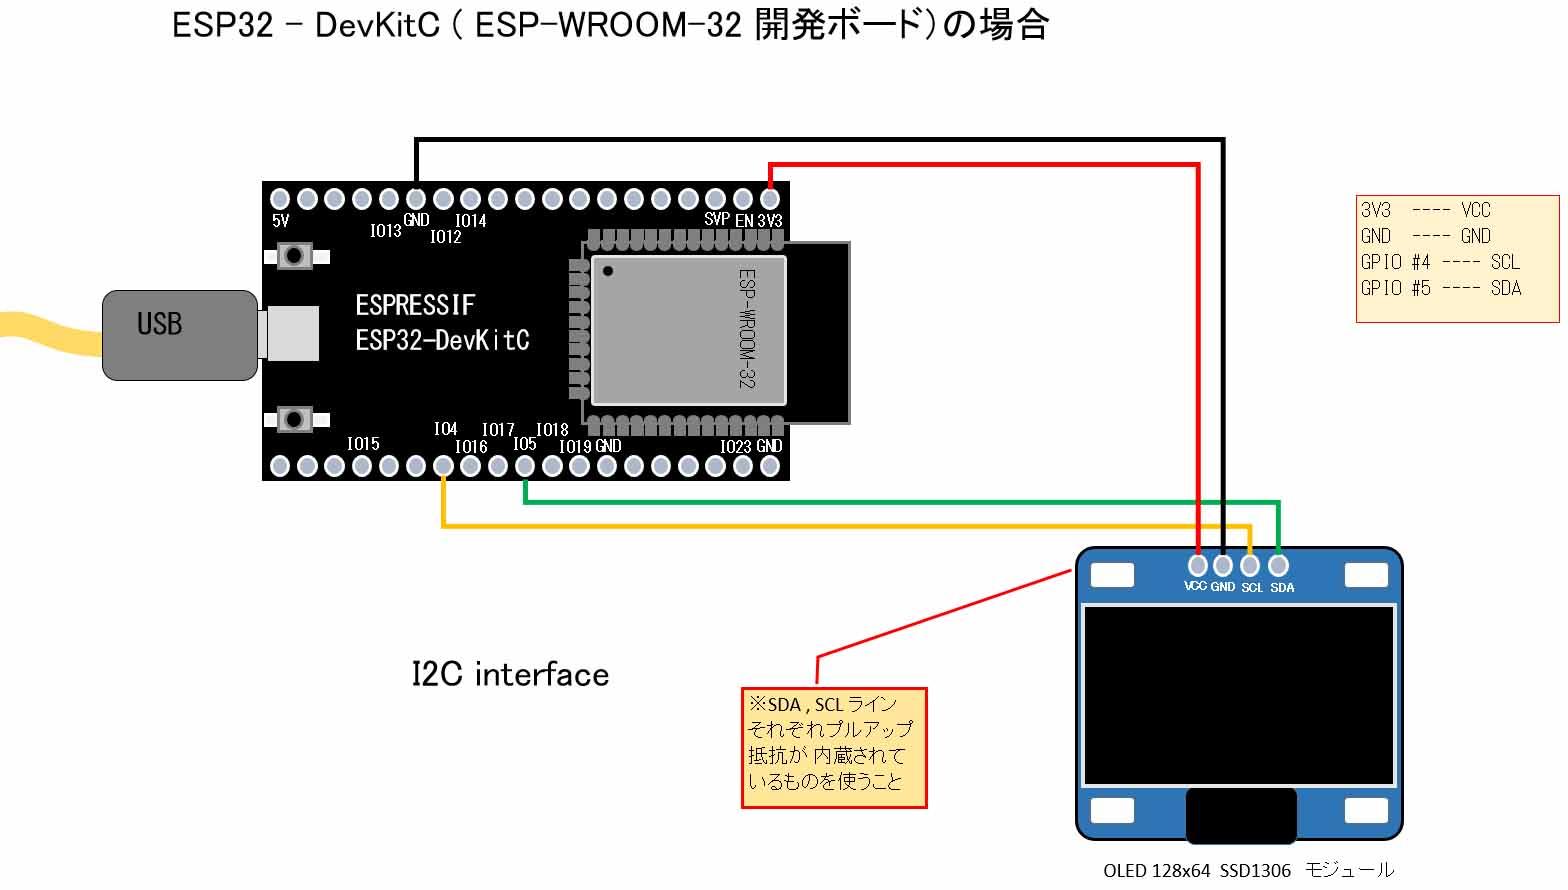 esp32_ssd1306_sizeup_font_01.jpg